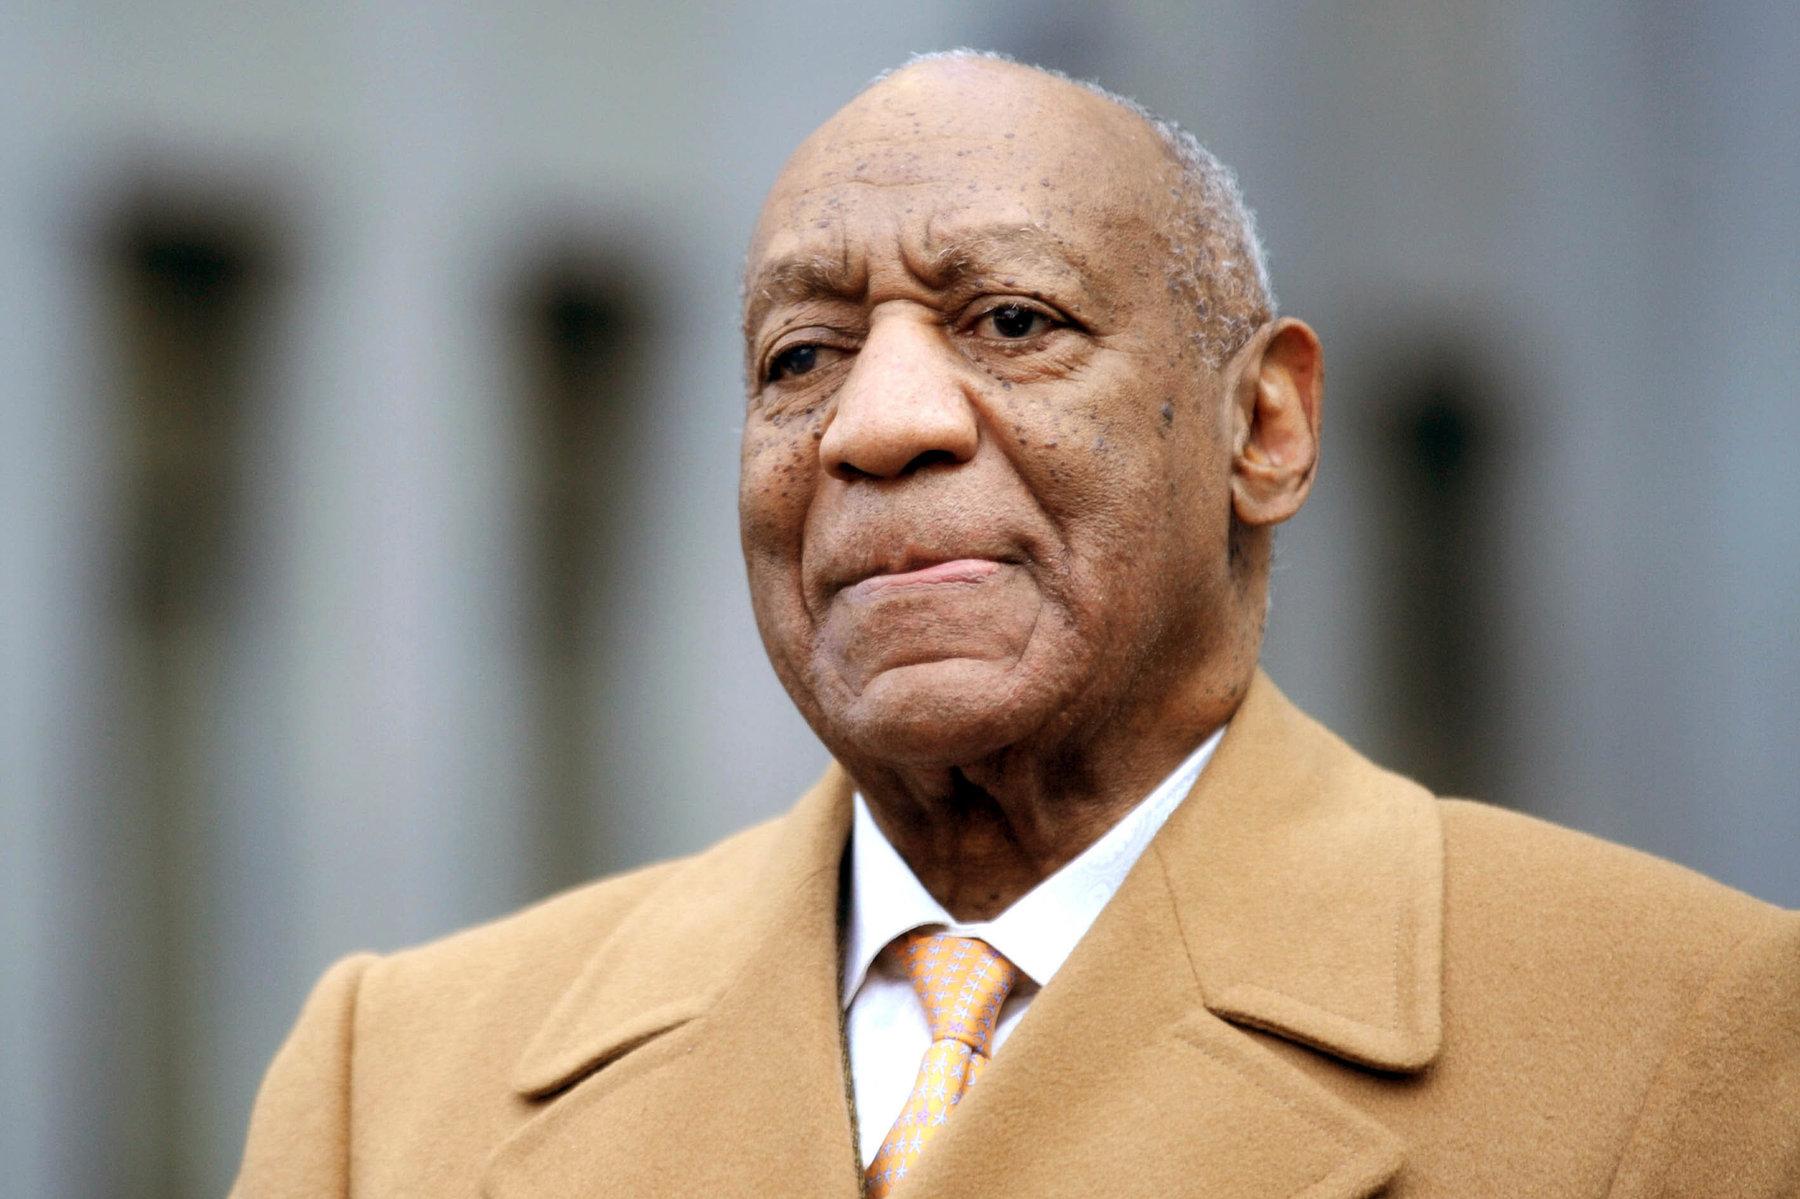 Bill Cosby Release Date From Prison